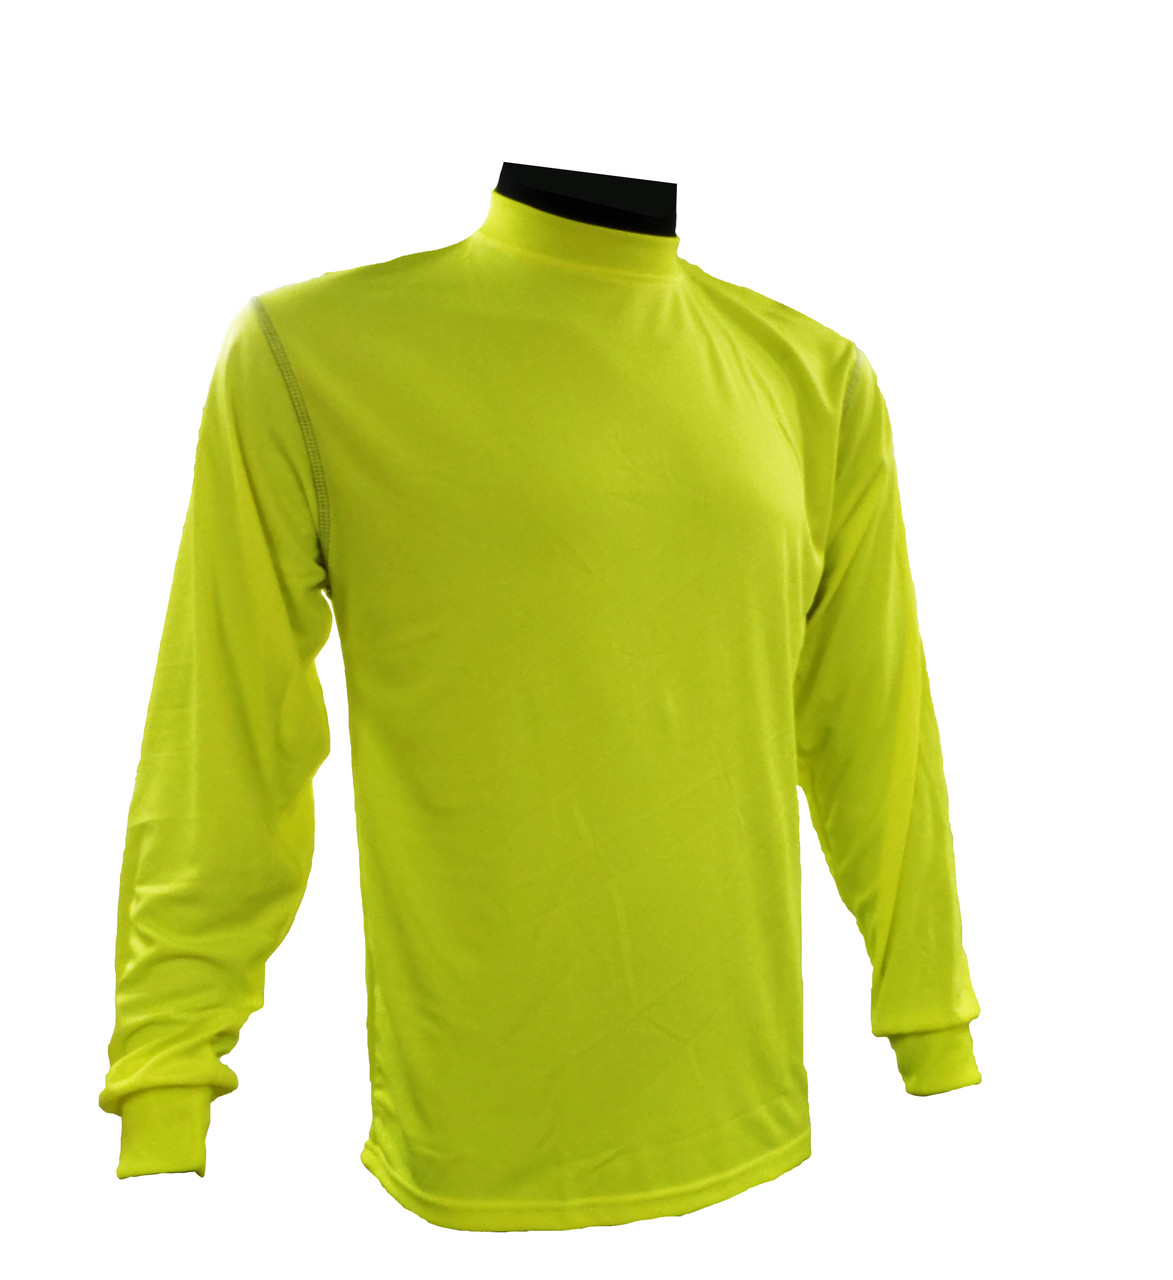 Hi-Vis Dri Knit® Long Sleeve Shirts  ##G2500 ##